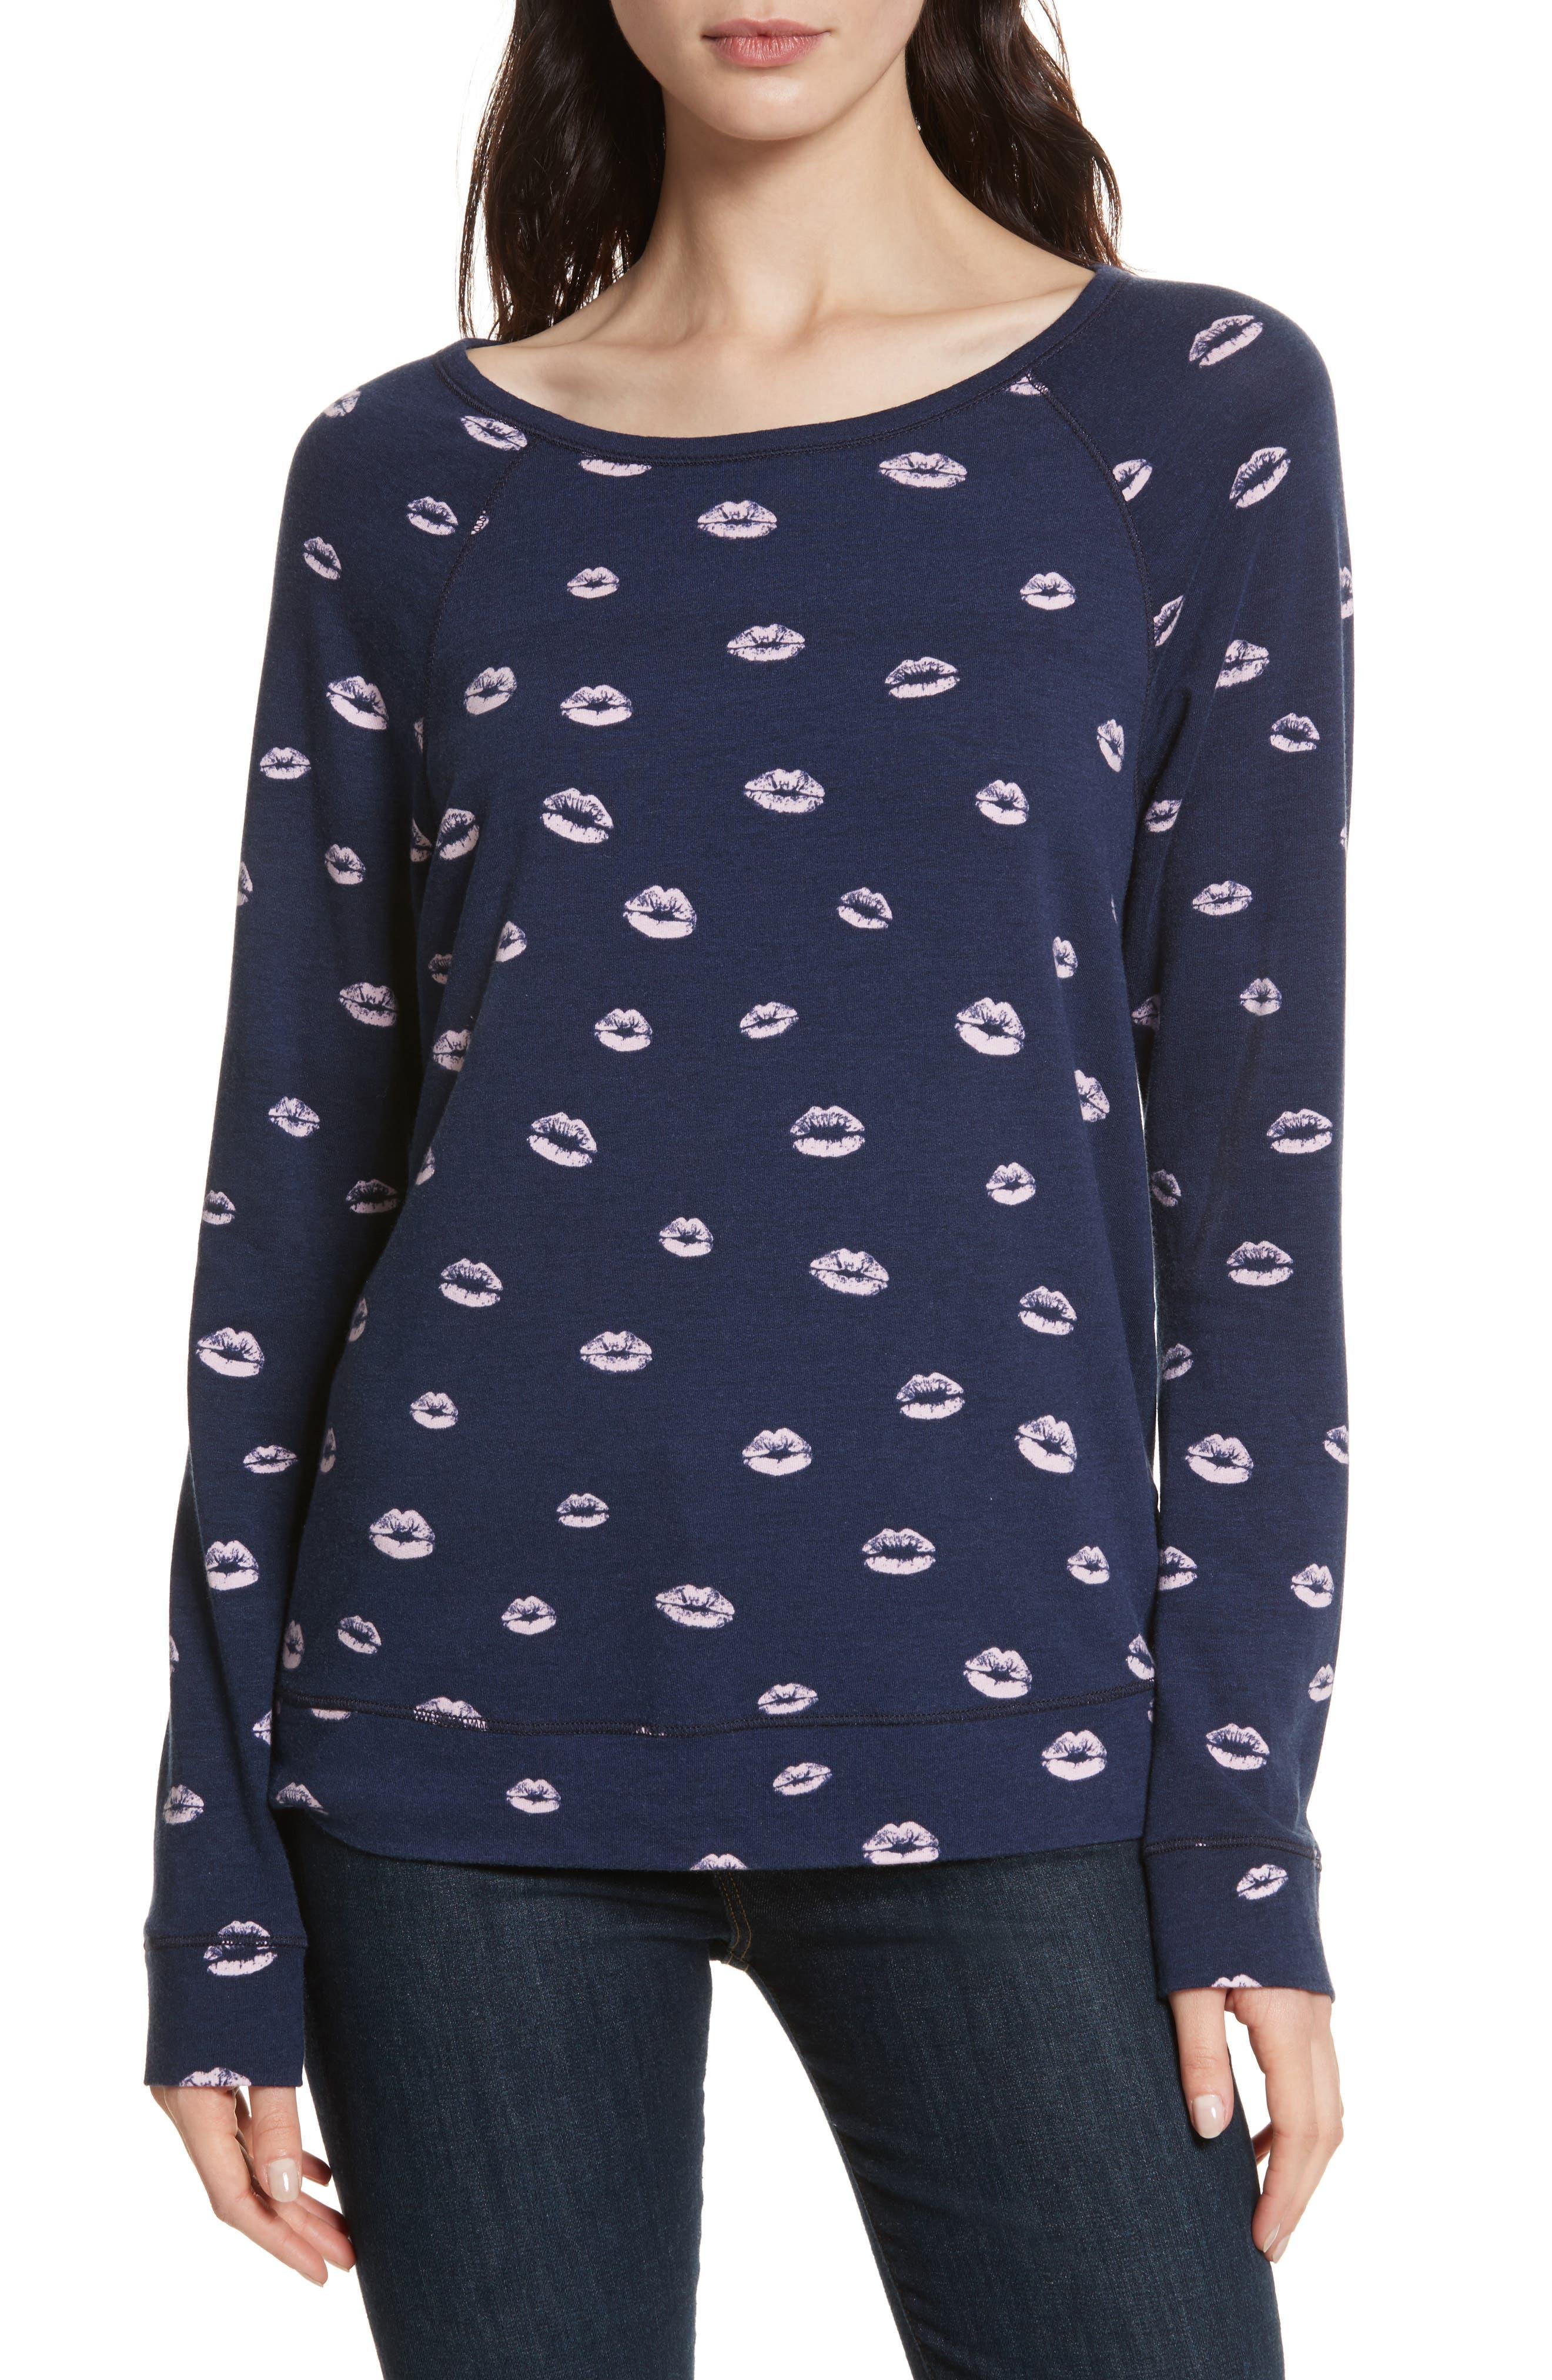 Annora B Kiss Print Sweatshirt,                             Main thumbnail 1, color,                             403